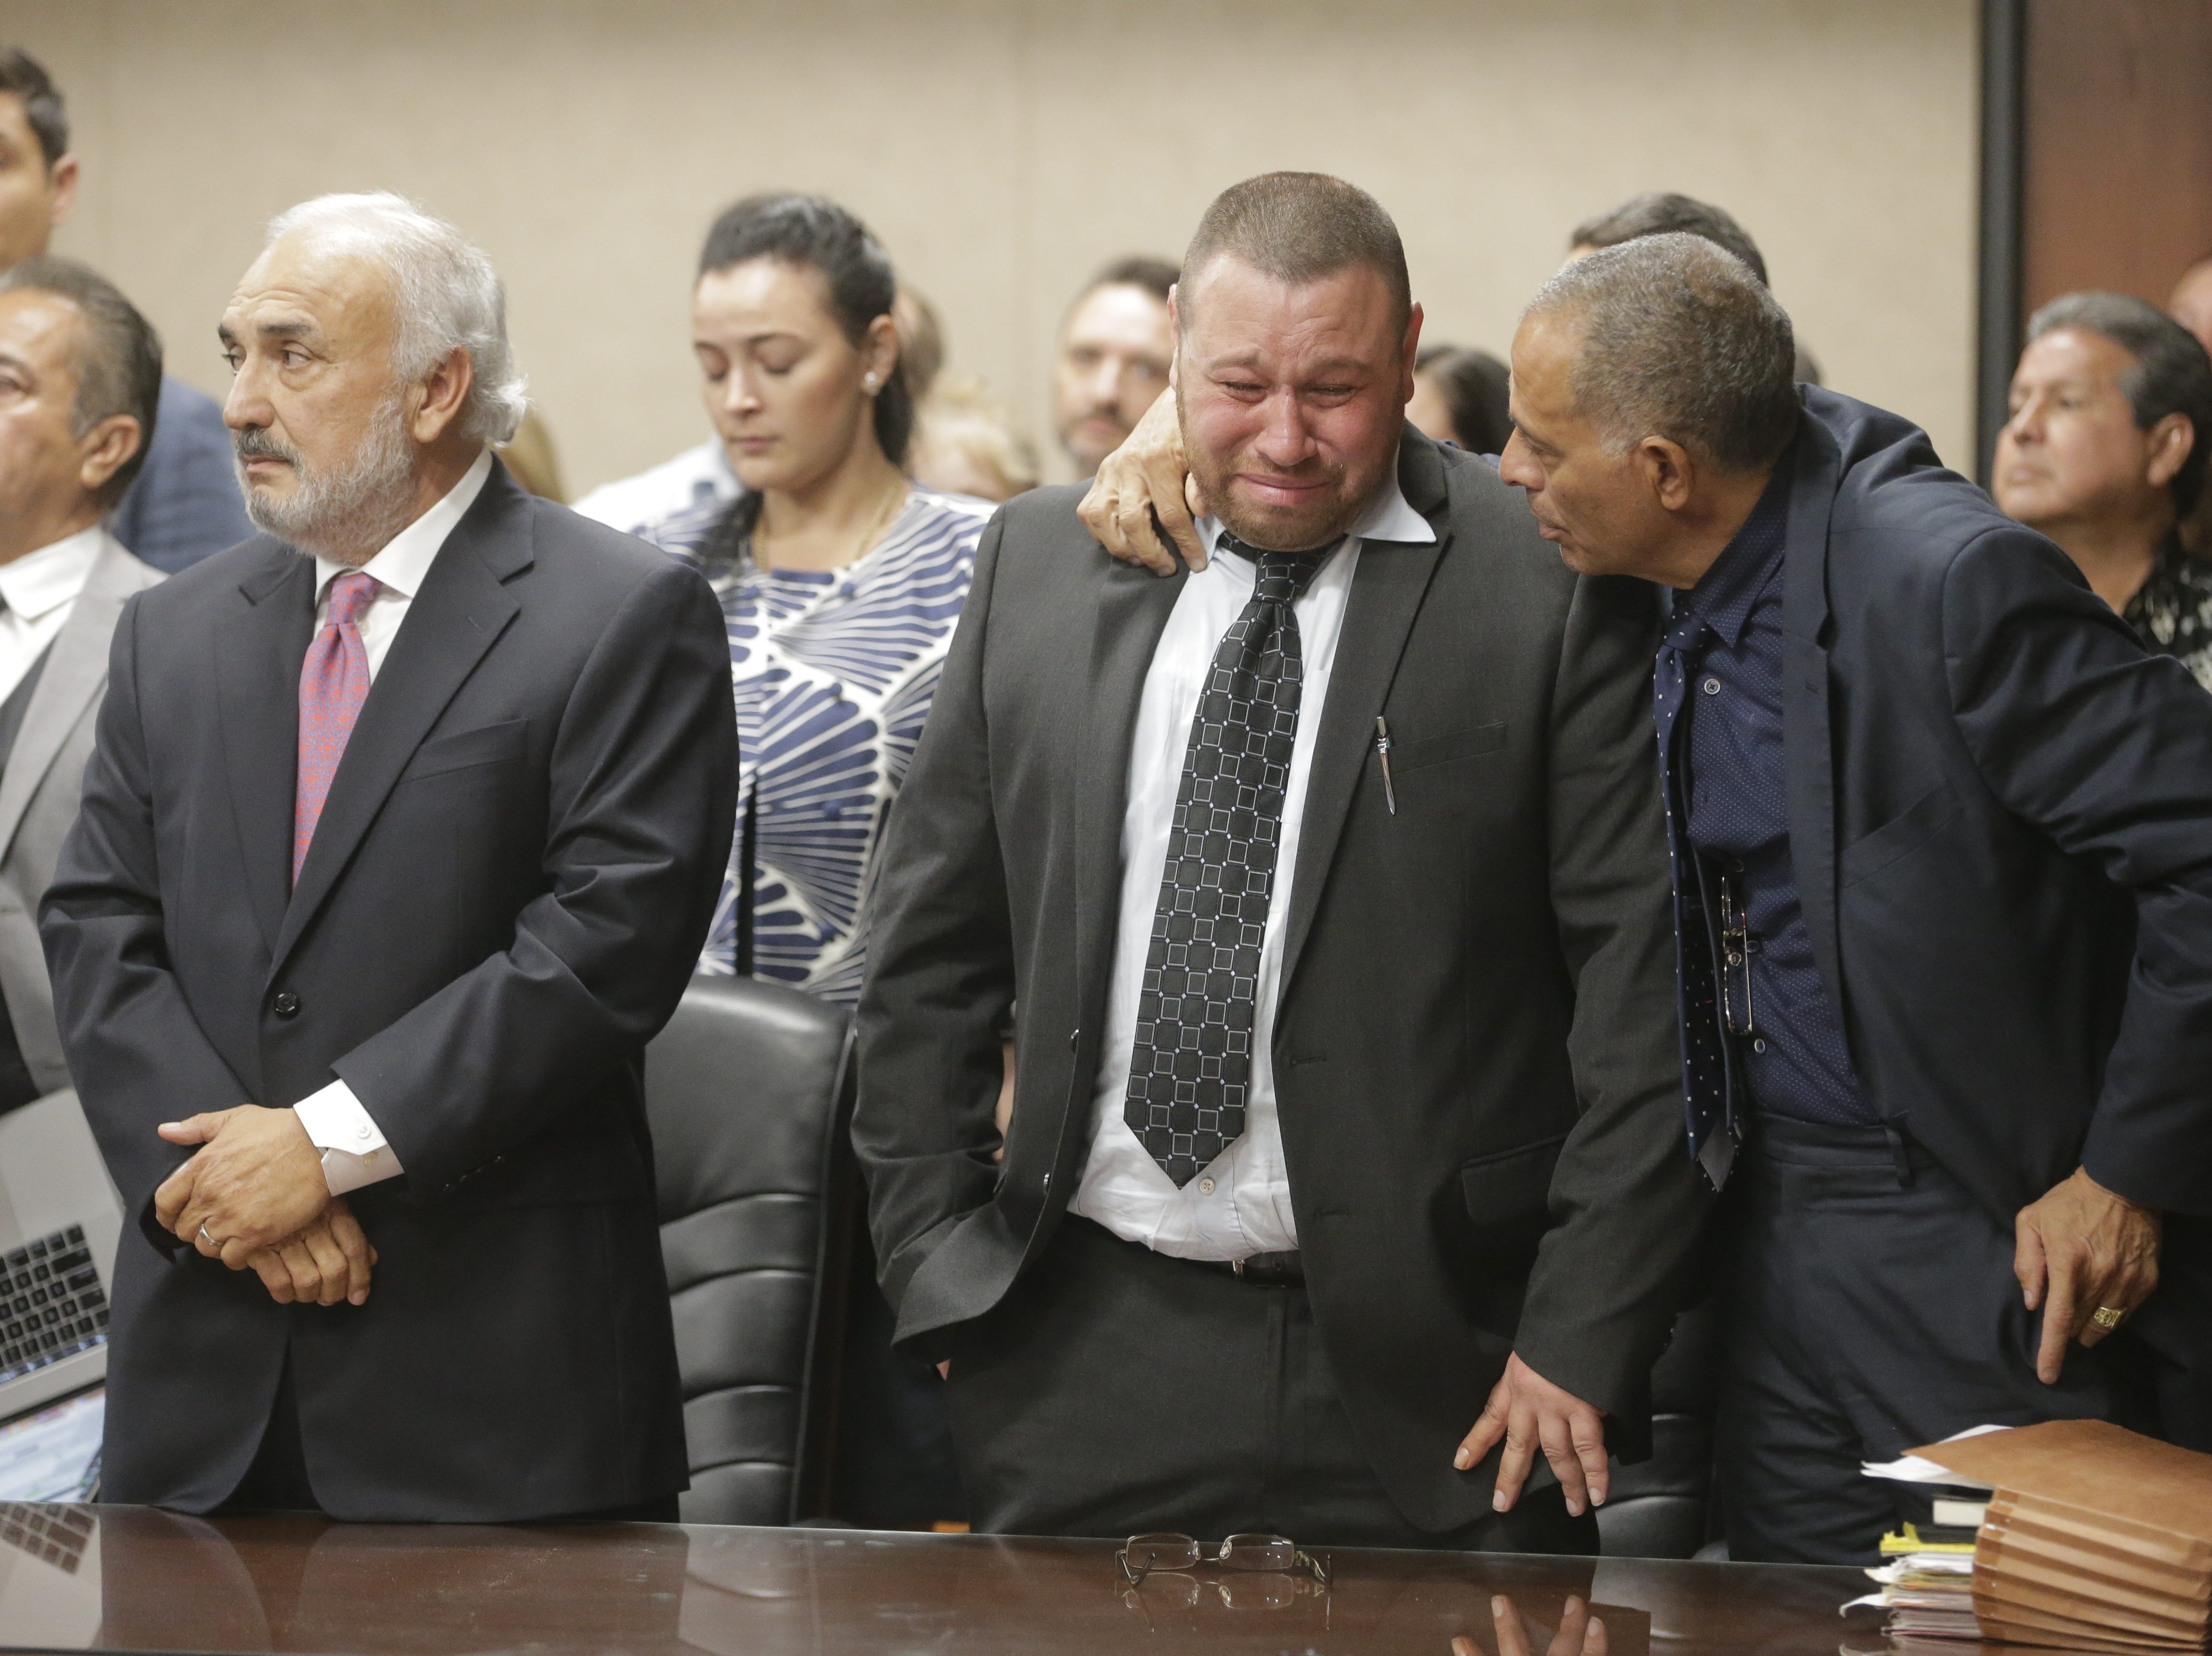 Daniel Villegas' attorney Felix Valenzuela puts his arm around Villegas after the not guilty verdict was read in court Friday.